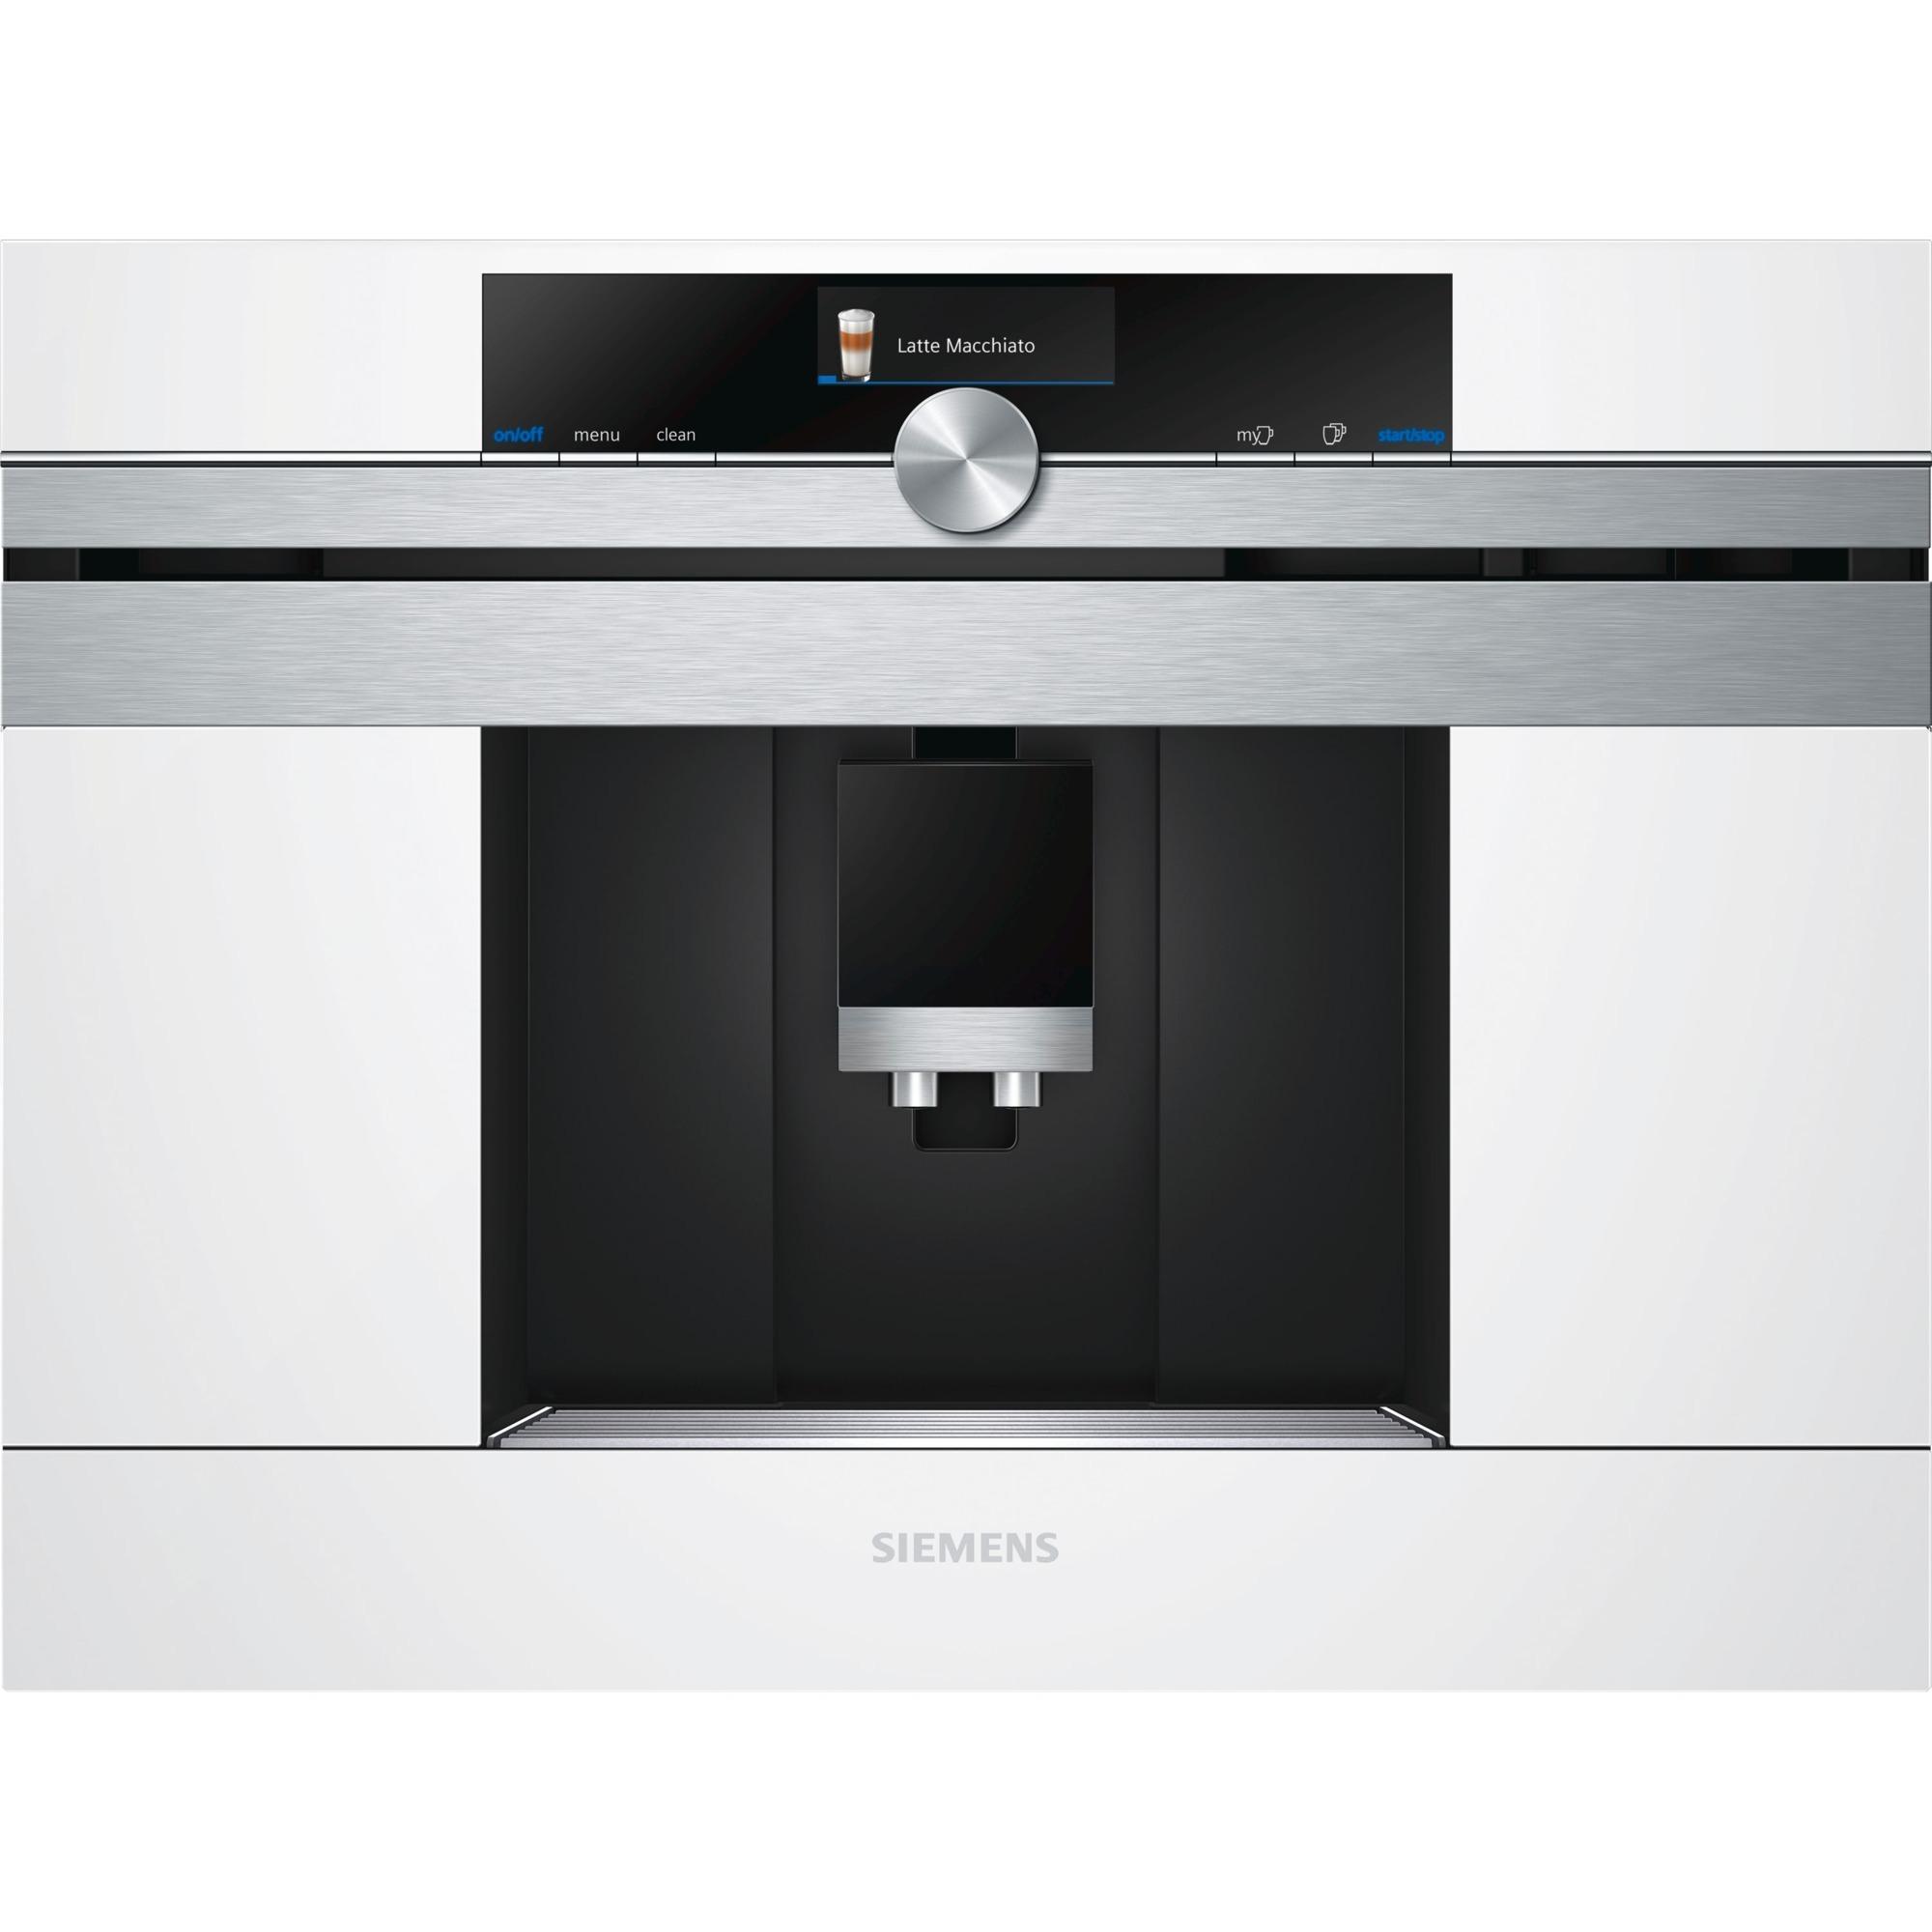 CT636LEW1 cafetera eléctrica Integrado Máquina espresso 2,4 L Totalmente automática, Superautomática